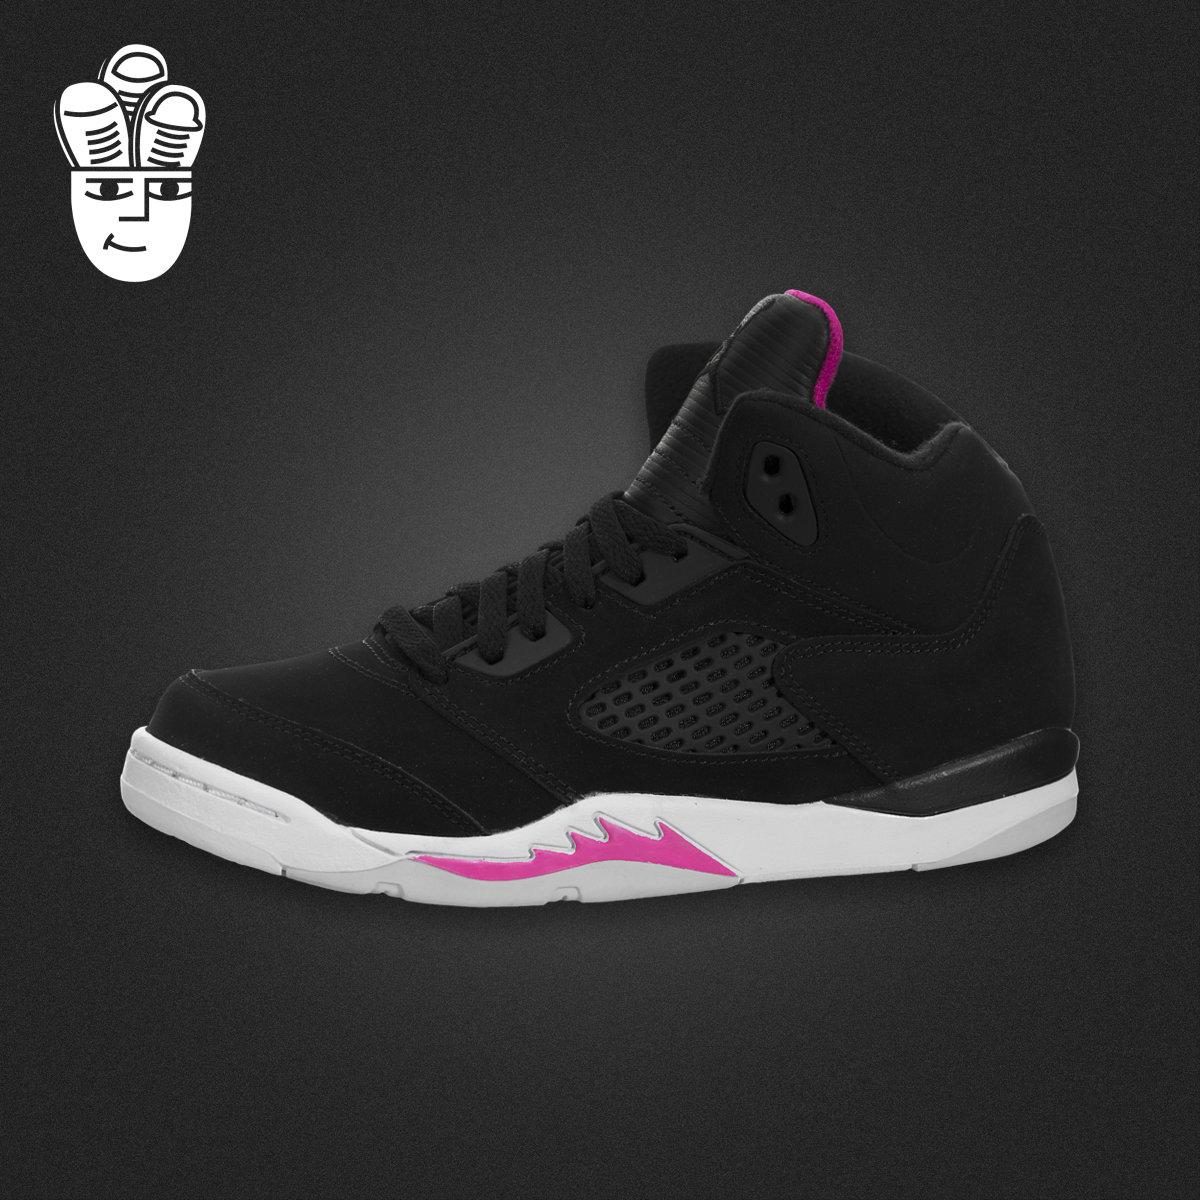 Air Jordan V Retro AJ乔5儿童鞋 复刻篮球鞋 潮童运动休闲鞋